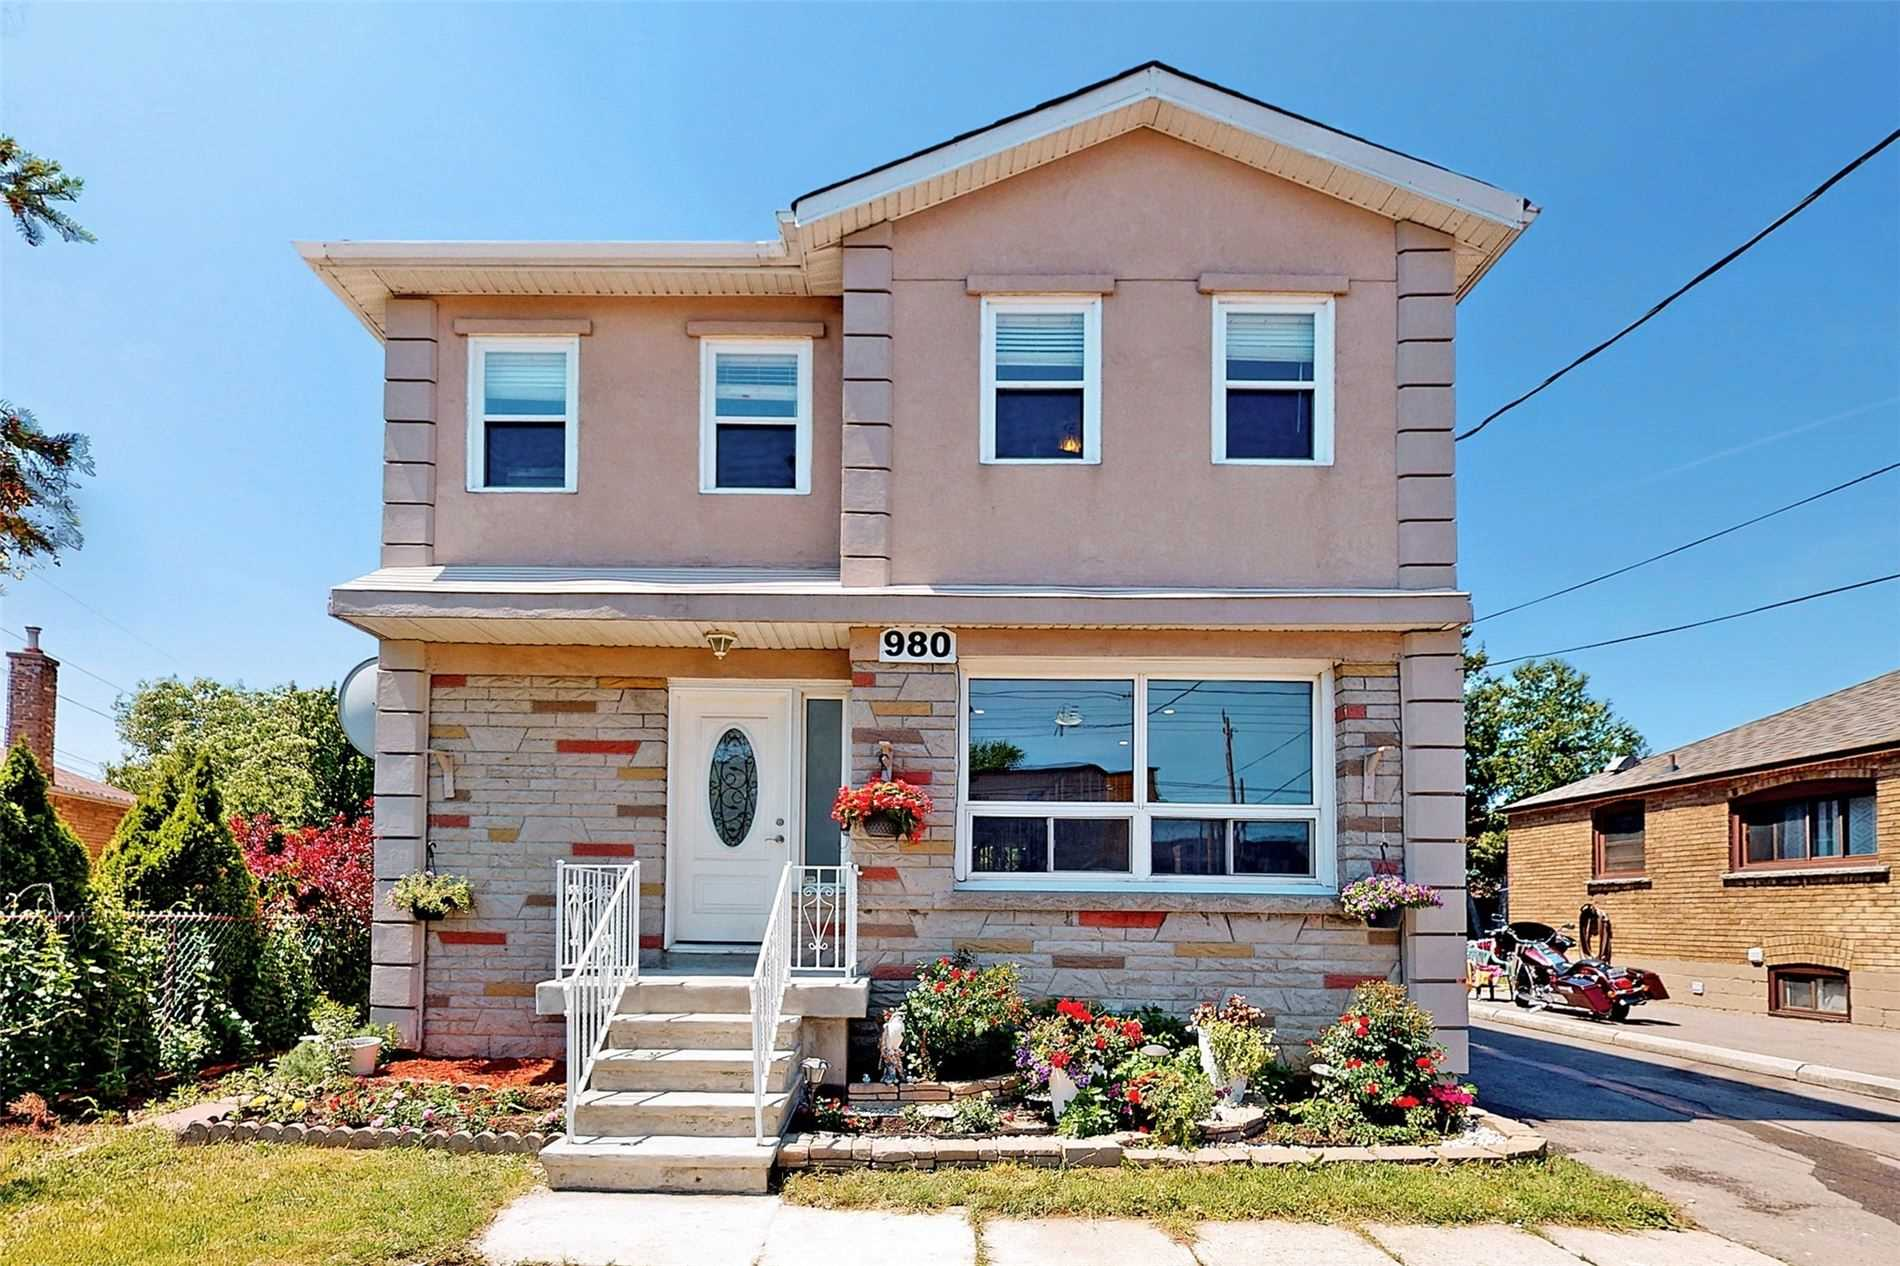 980 Warden Ave, Toronto, Ontario M1R2N8, 5 Bedrooms Bedrooms, 8 Rooms Rooms,4 BathroomsBathrooms,Detached,For Sale,Warden,E5303093